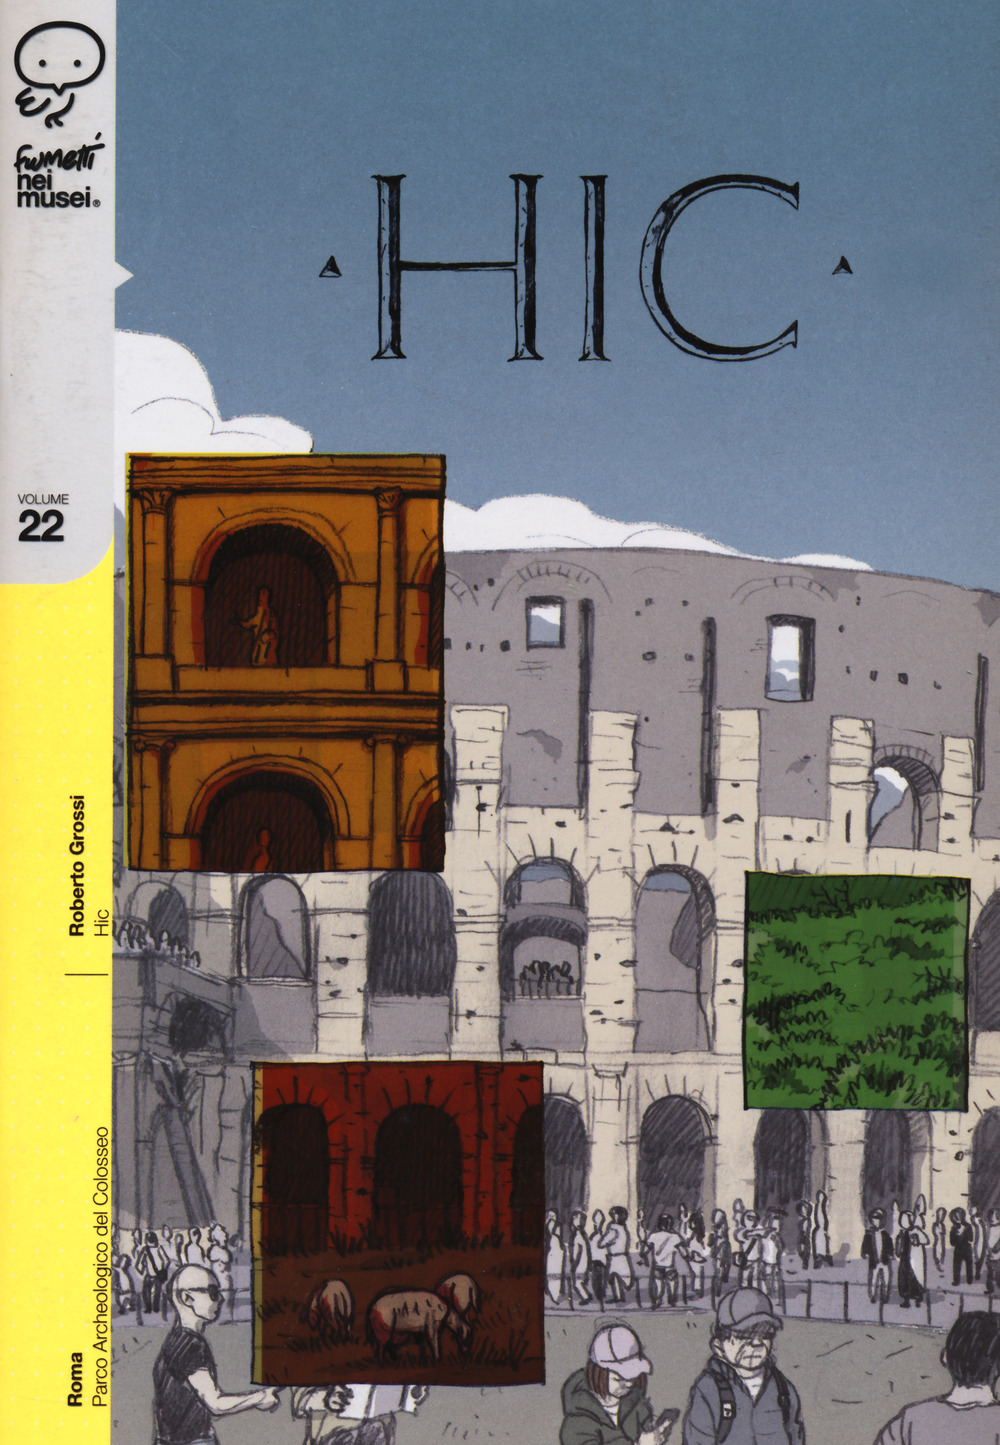 hic  vol.22 - Roberto Grossi - 9788876184925